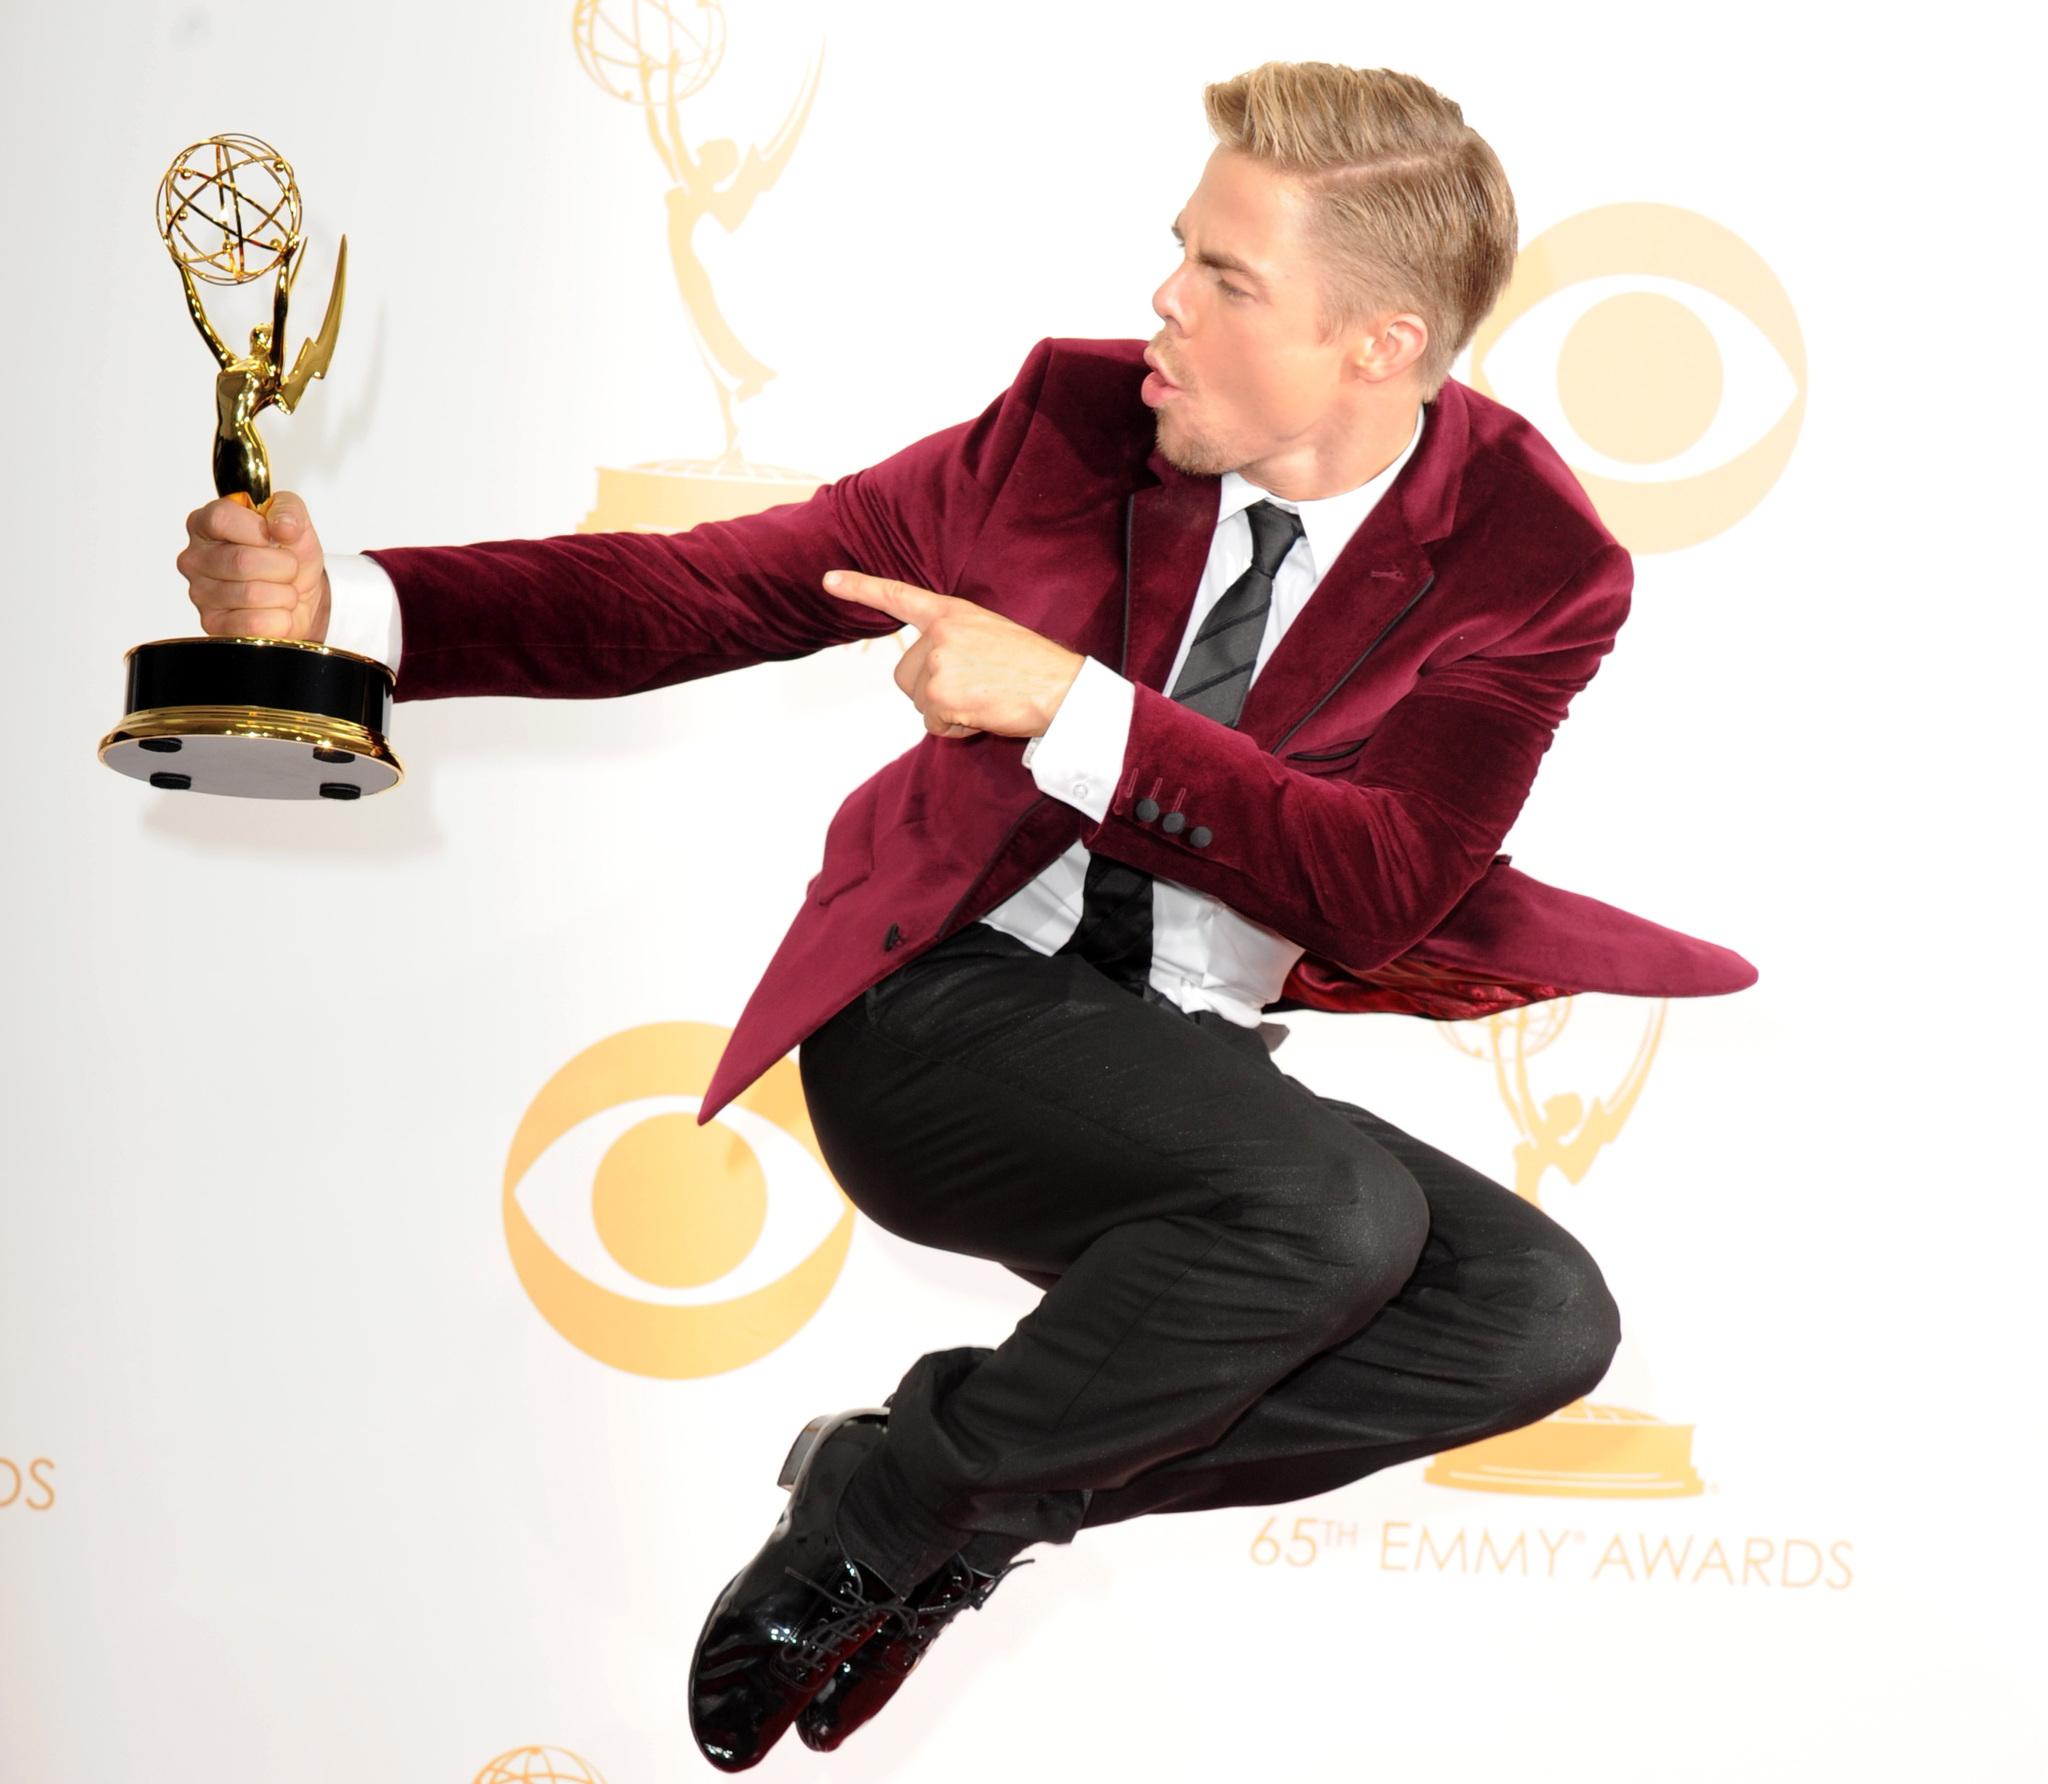 Derek Hough at an event for 2013 Primetime Creative Arts Emmy Awards (2013)